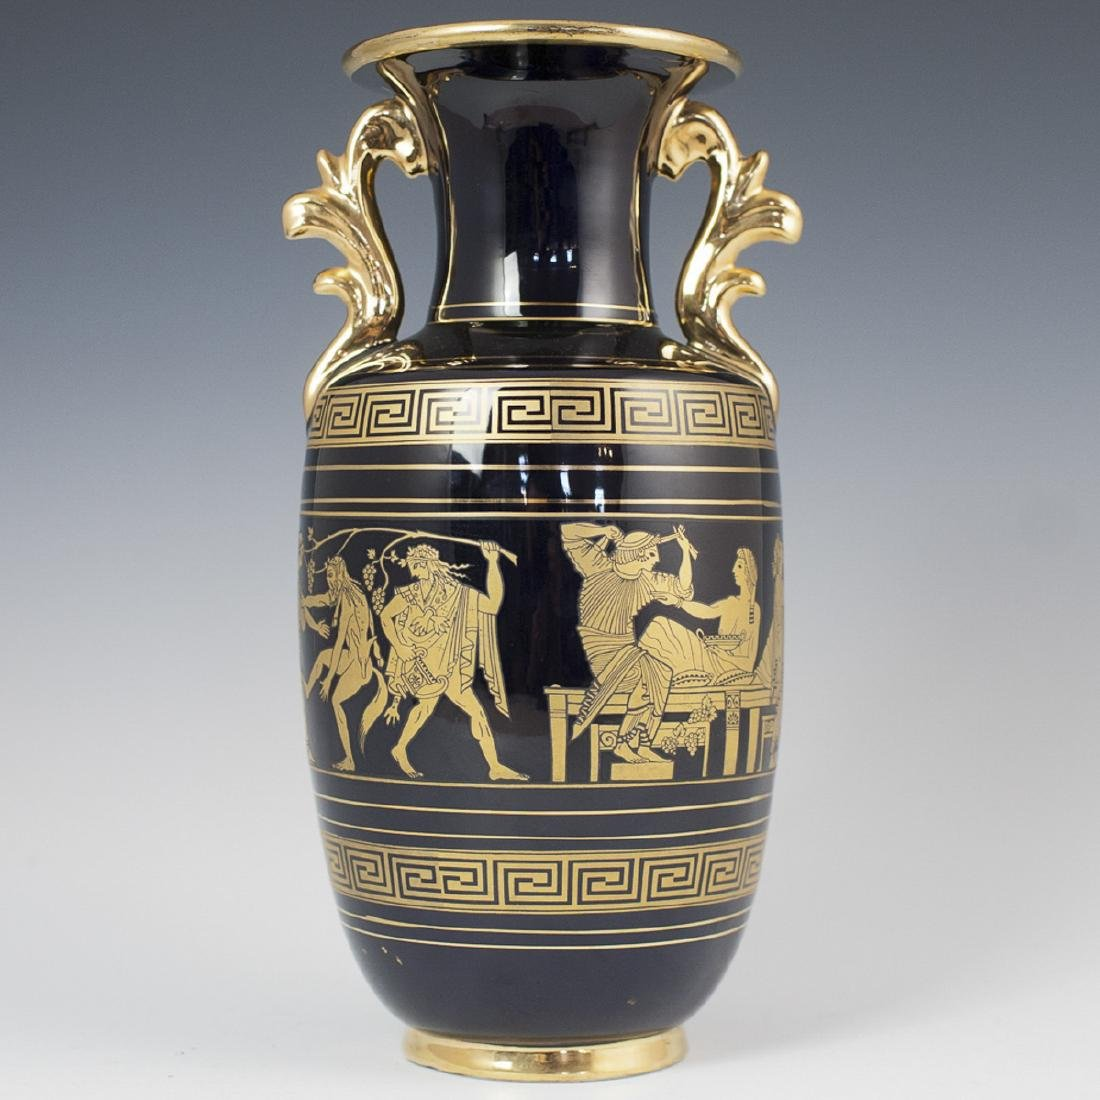 Vintage Greco-Roman Style Vase